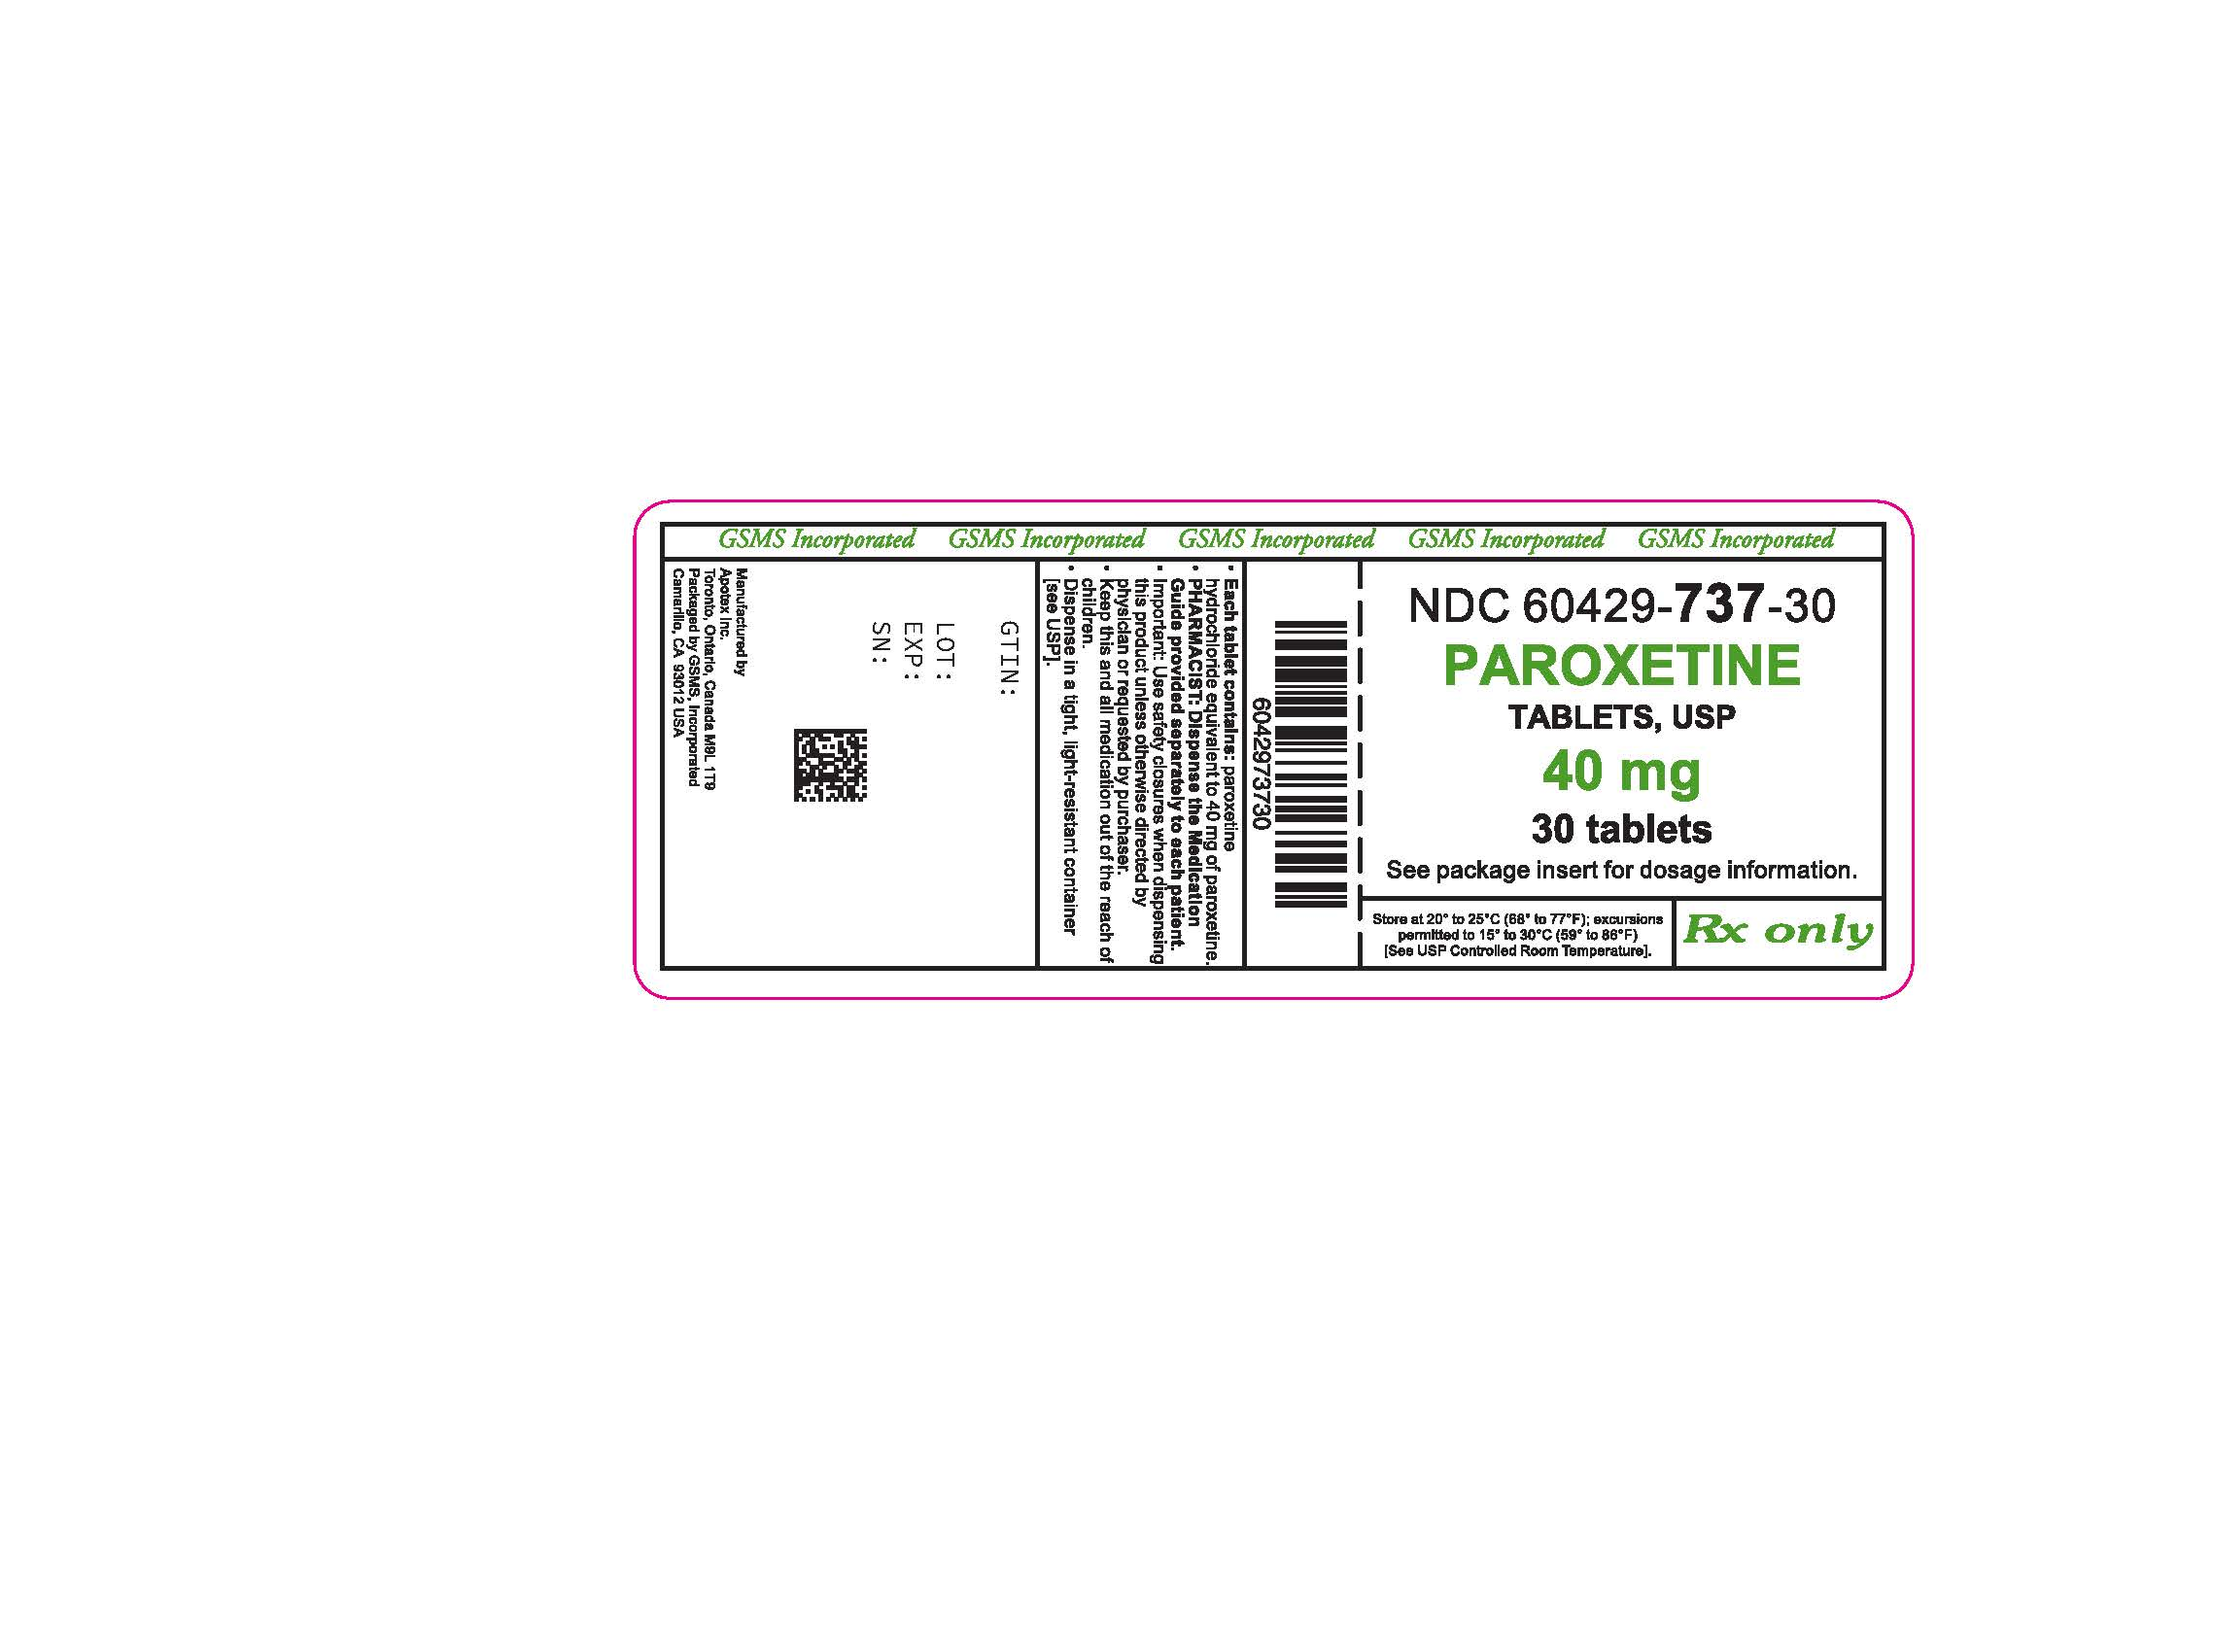 60429-737-30LB - PAROXETINE HCl 40 MG TABS.jpg